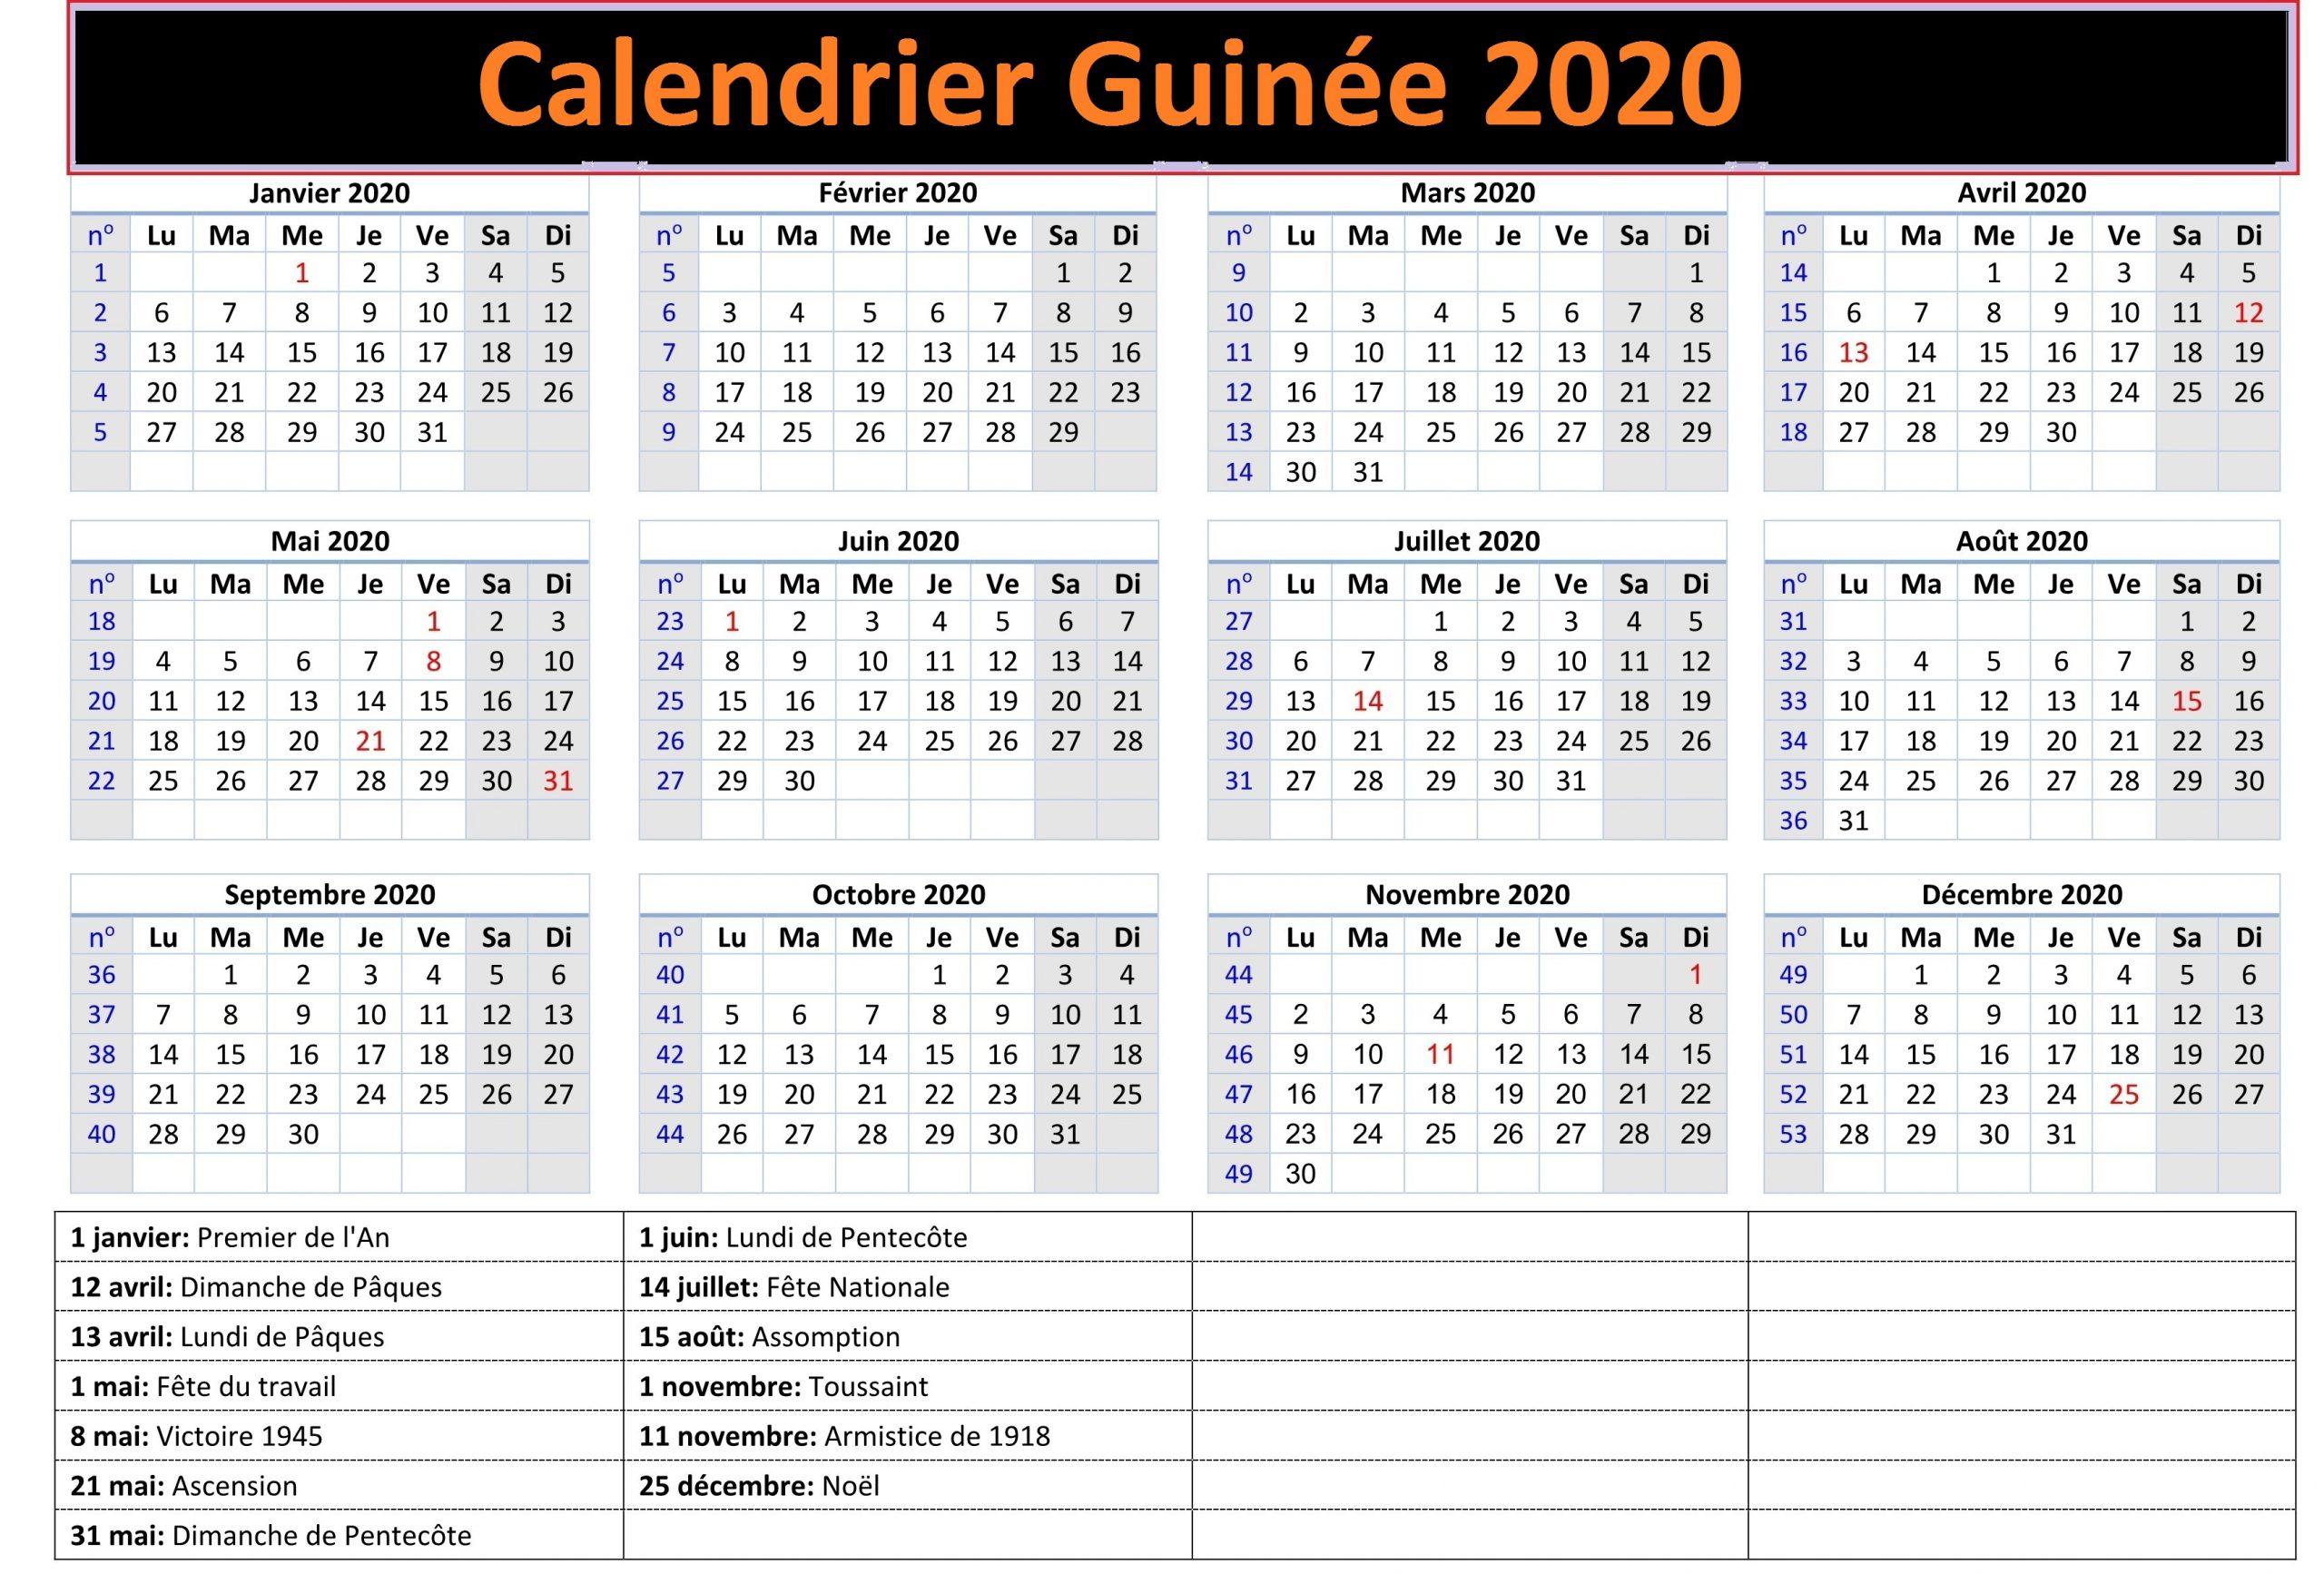 Calendrier Ramadan Guinée 2020